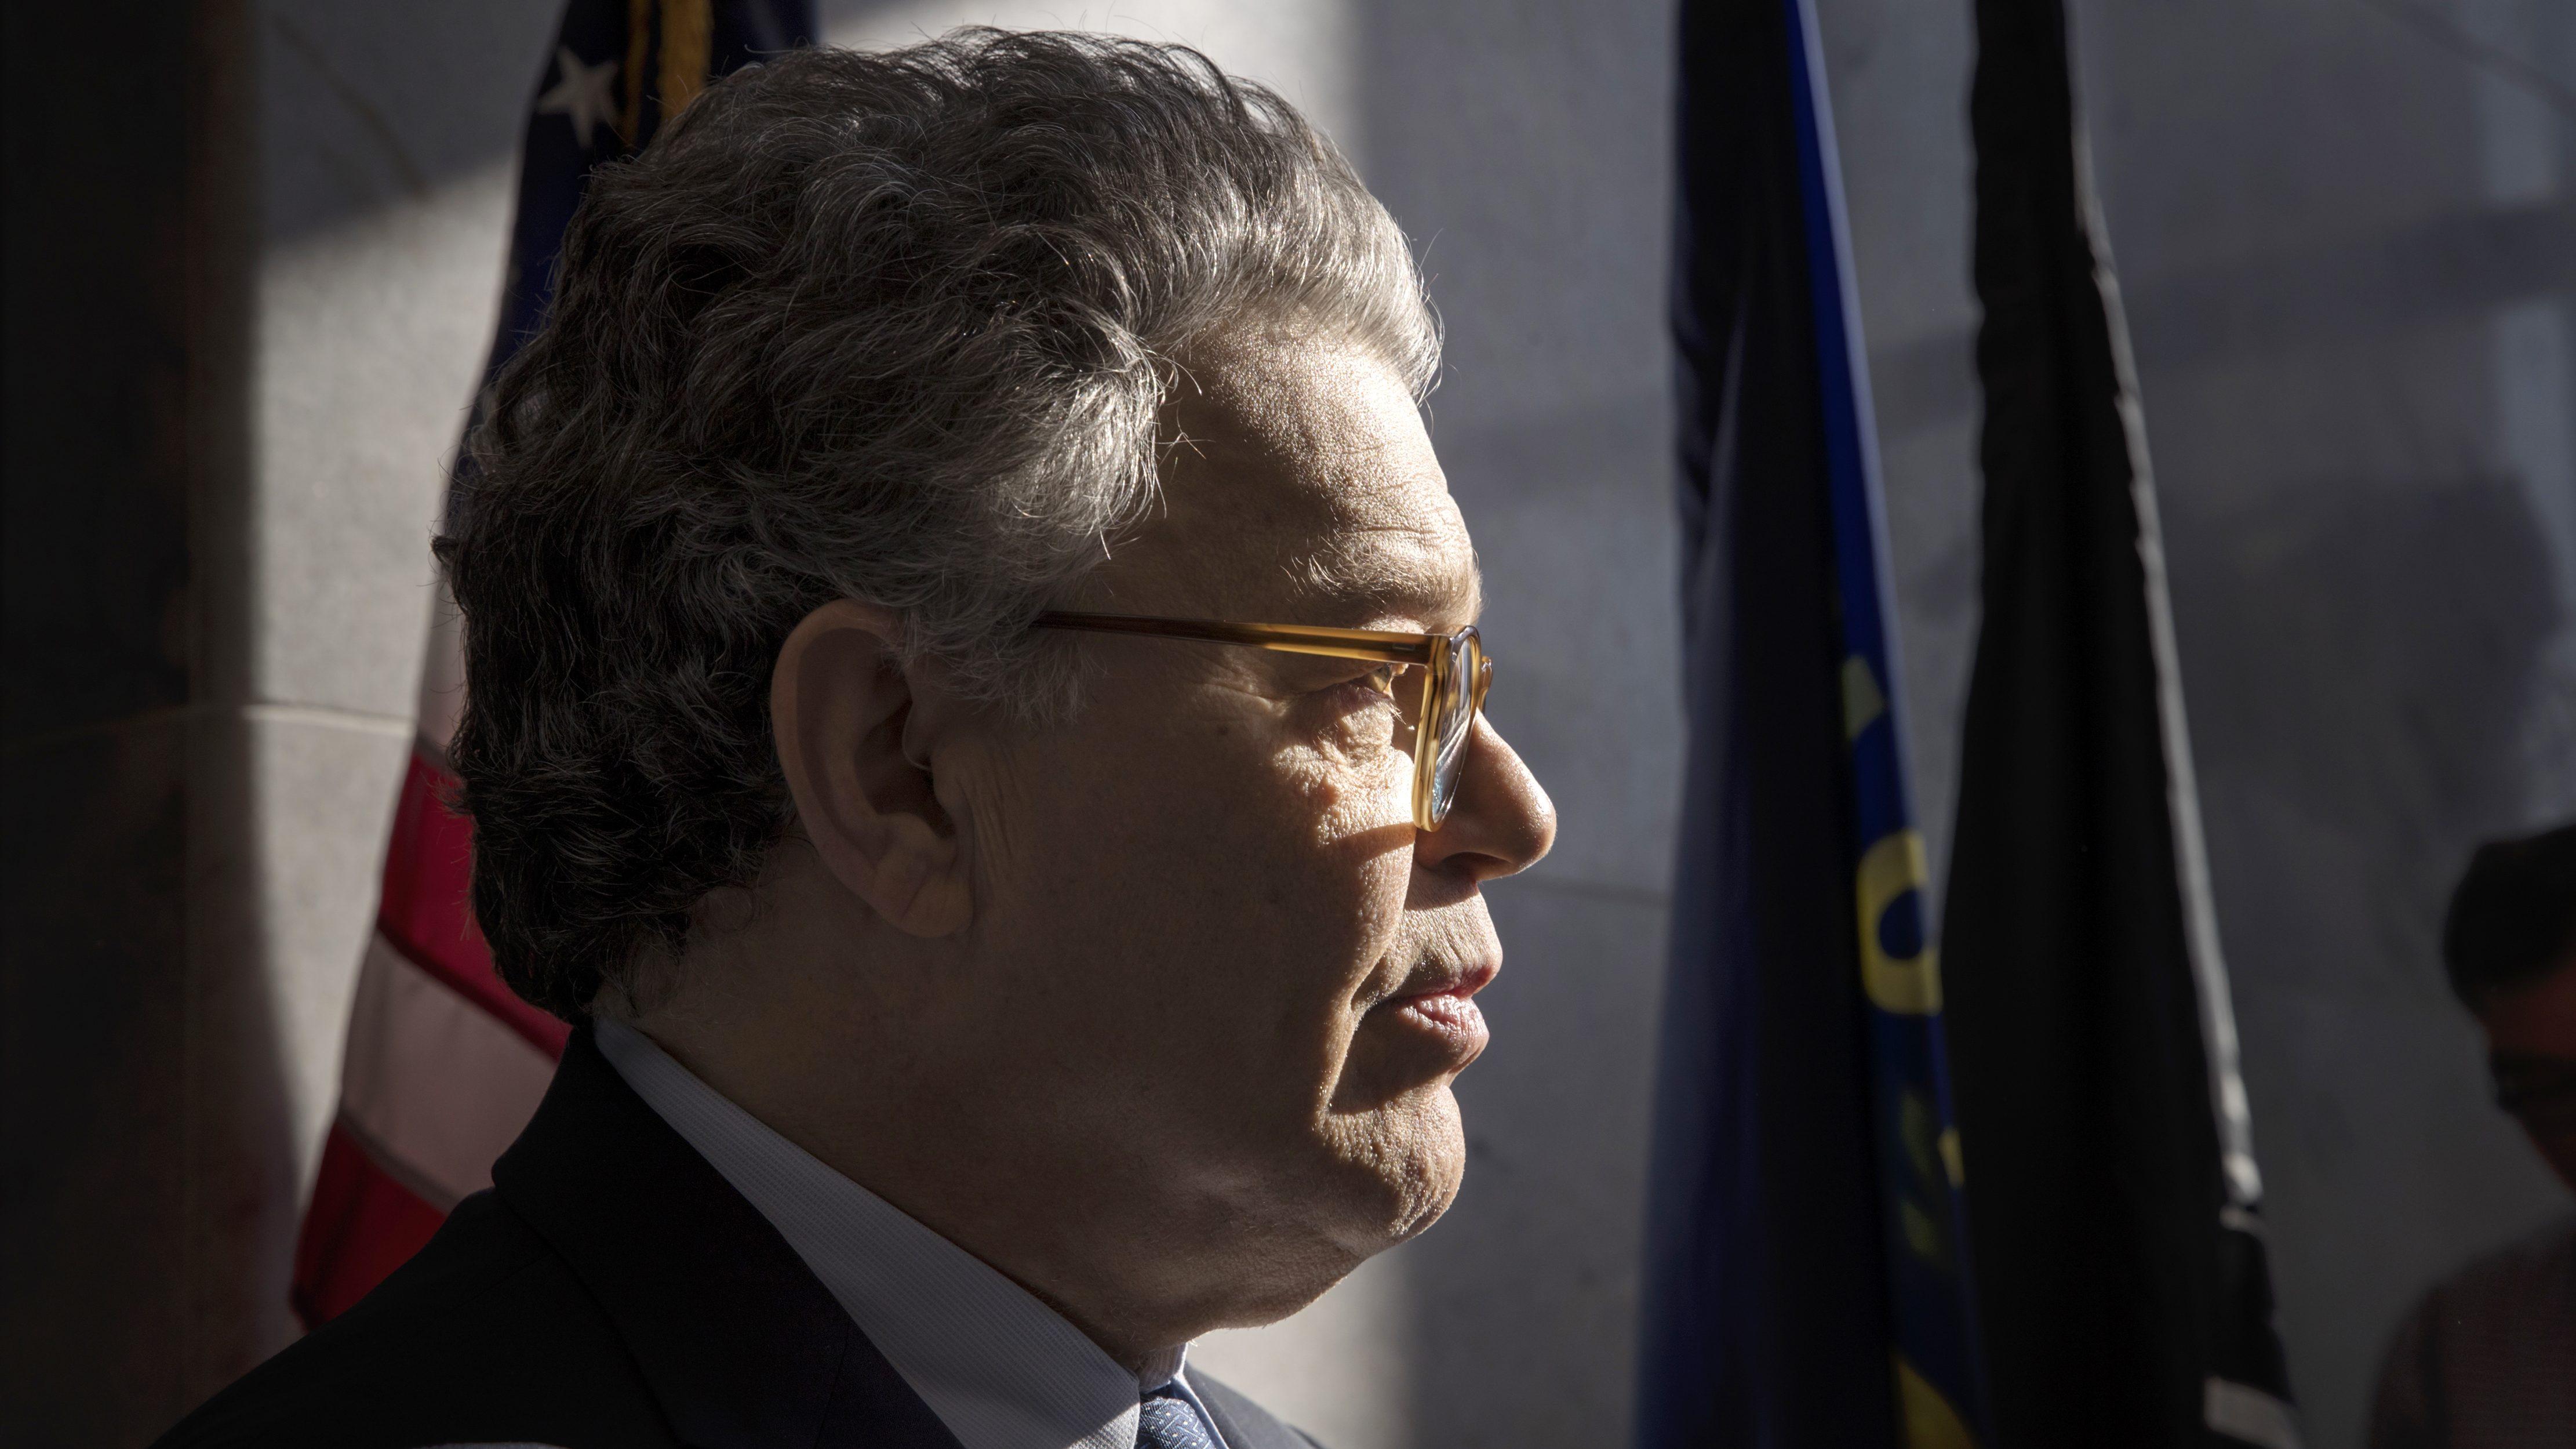 US senators are calling for Al Franken to resign